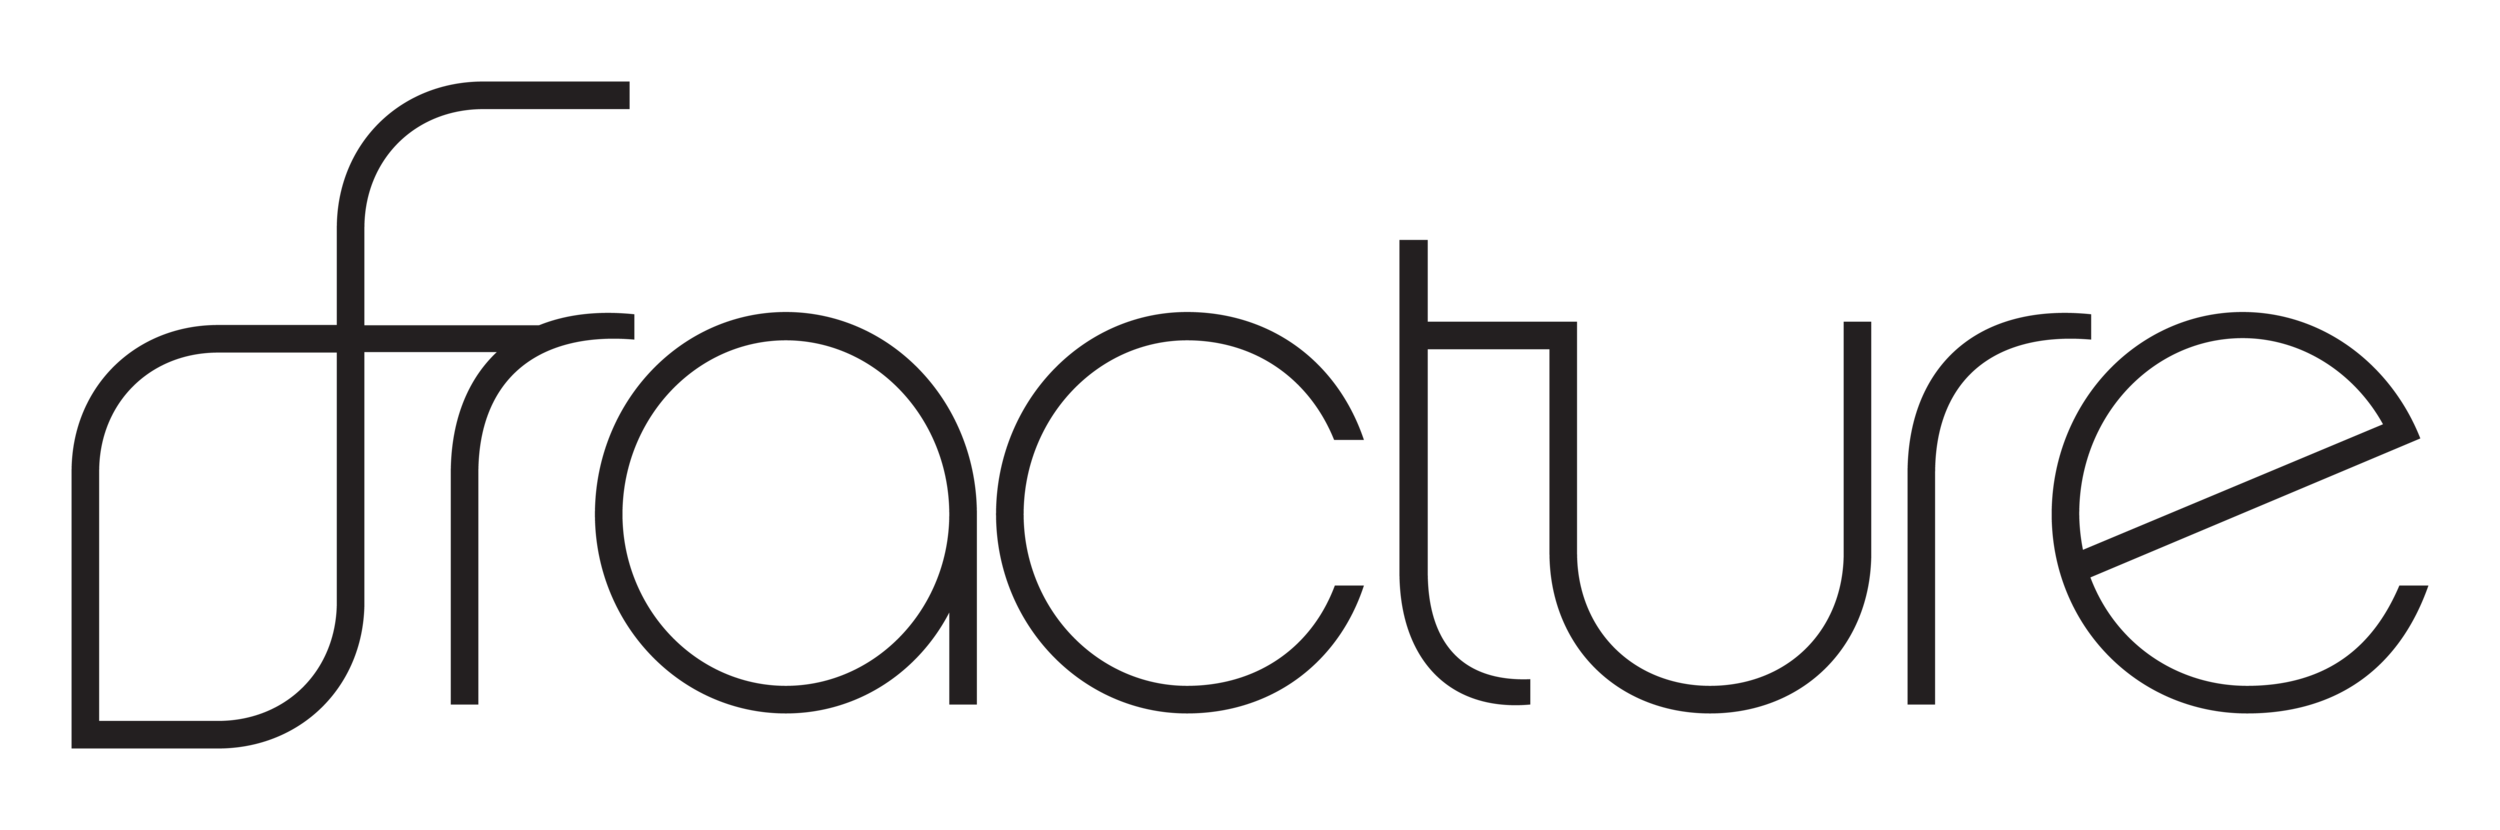 Fracture_logo_transparent_HiRes_Black.png